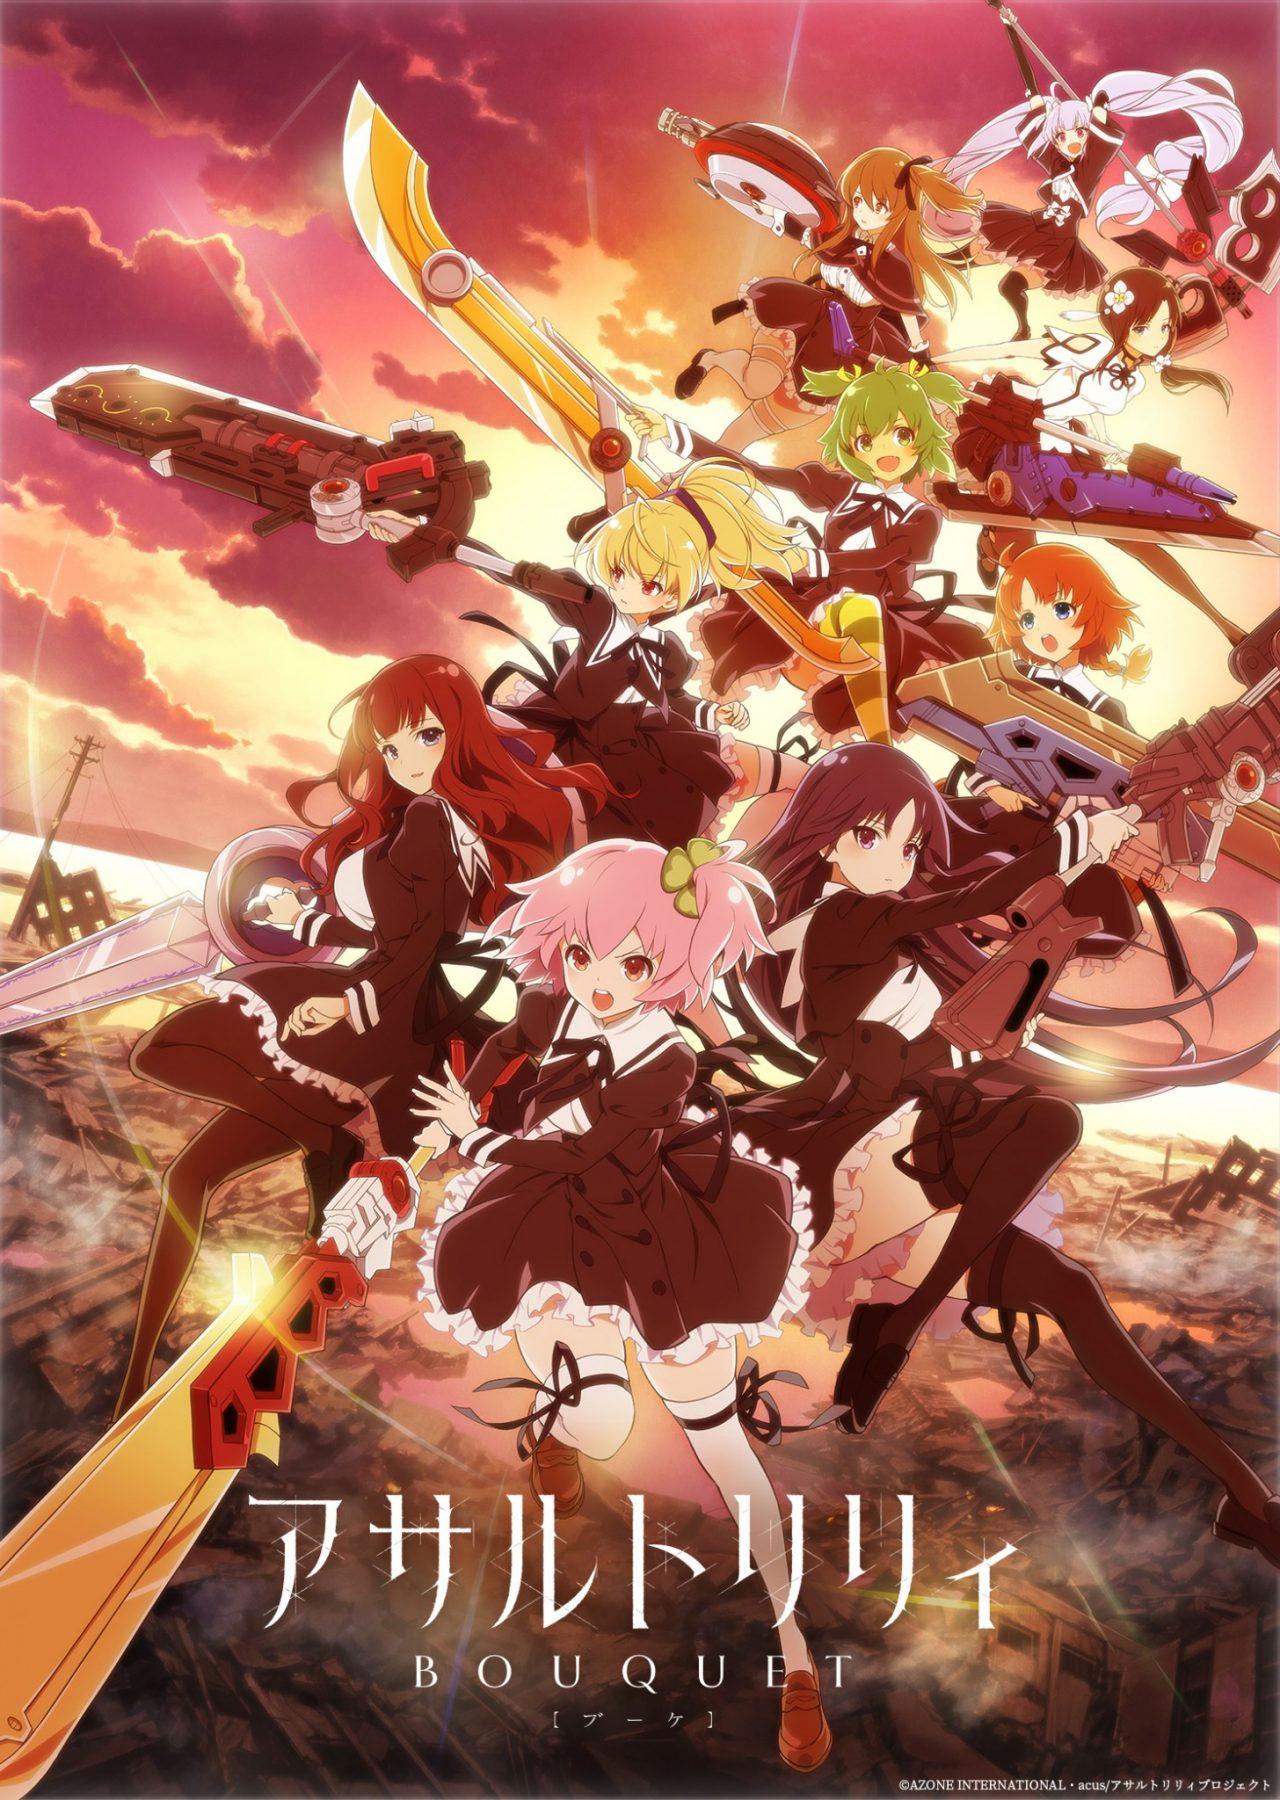 "<span class=""title"">TVアニメ『アサルトリリィ BOUQUET』が10月1日(木)放送開始!第1話の先行場面カットが公開!</span>"